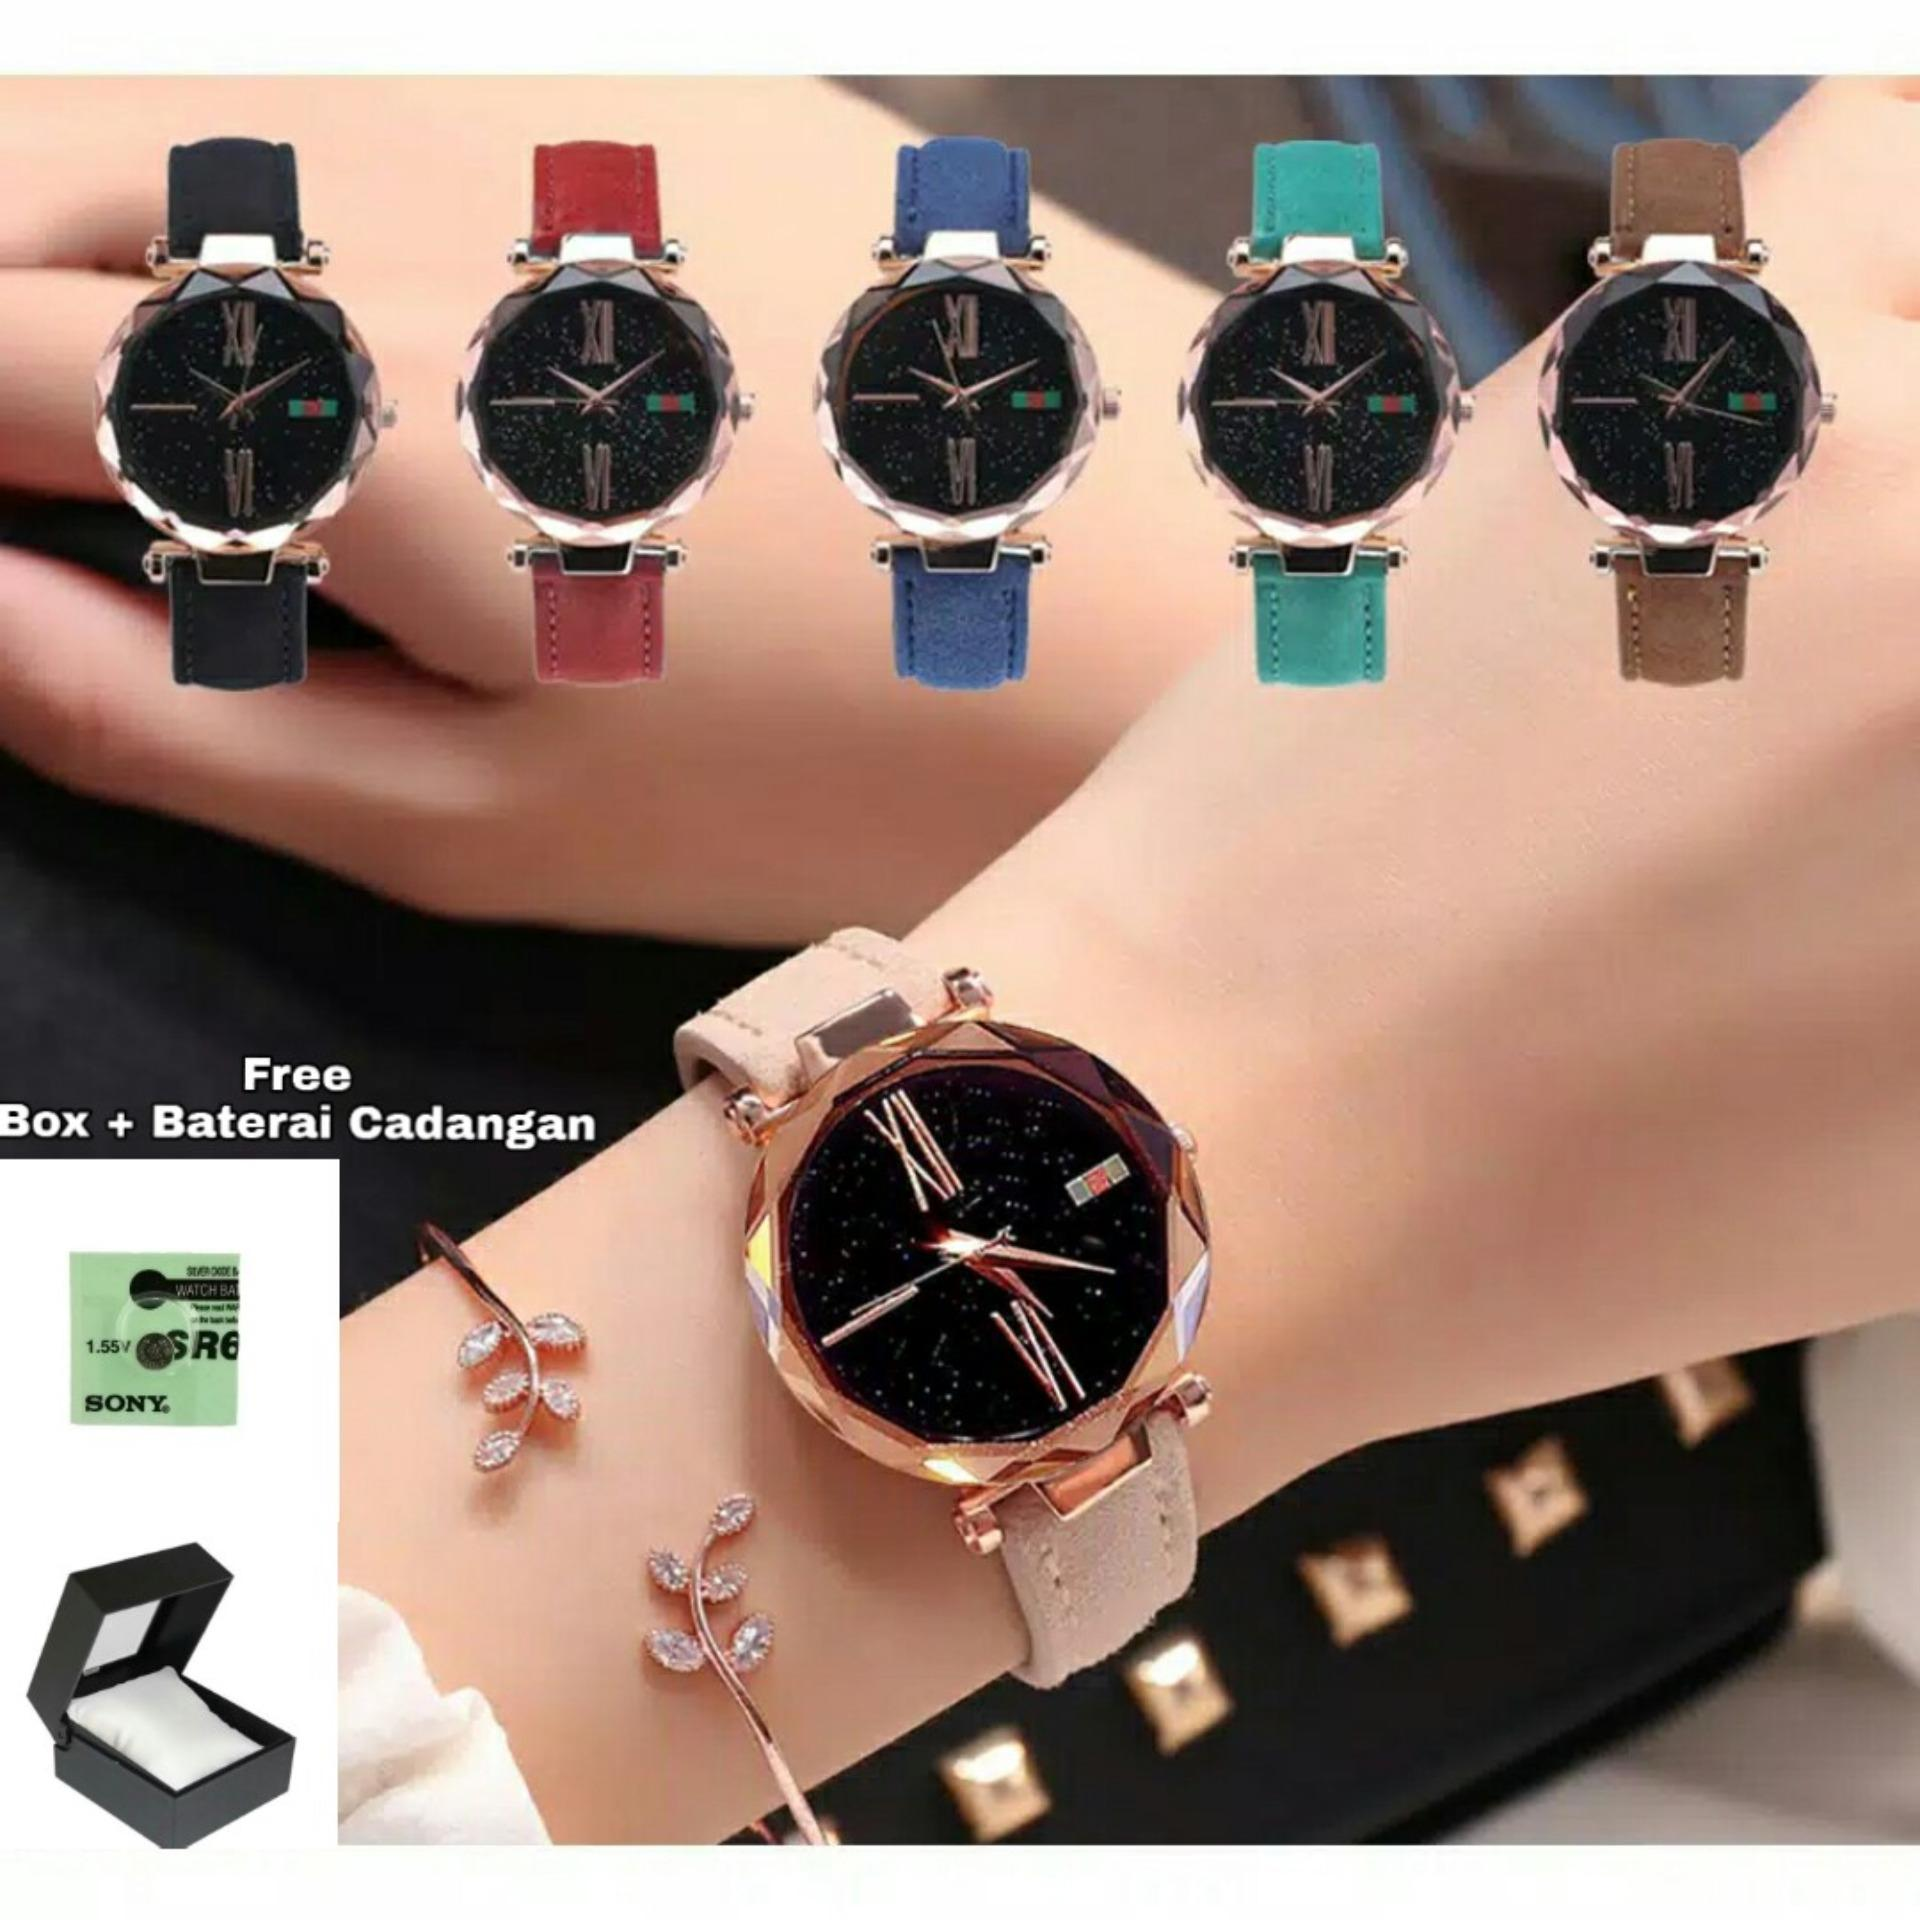 jaya shop jam tangan wanita kaca crystal quartz tali kulit FREE BOX dan  BATERAI CADANGAN BISA 3252f6883b